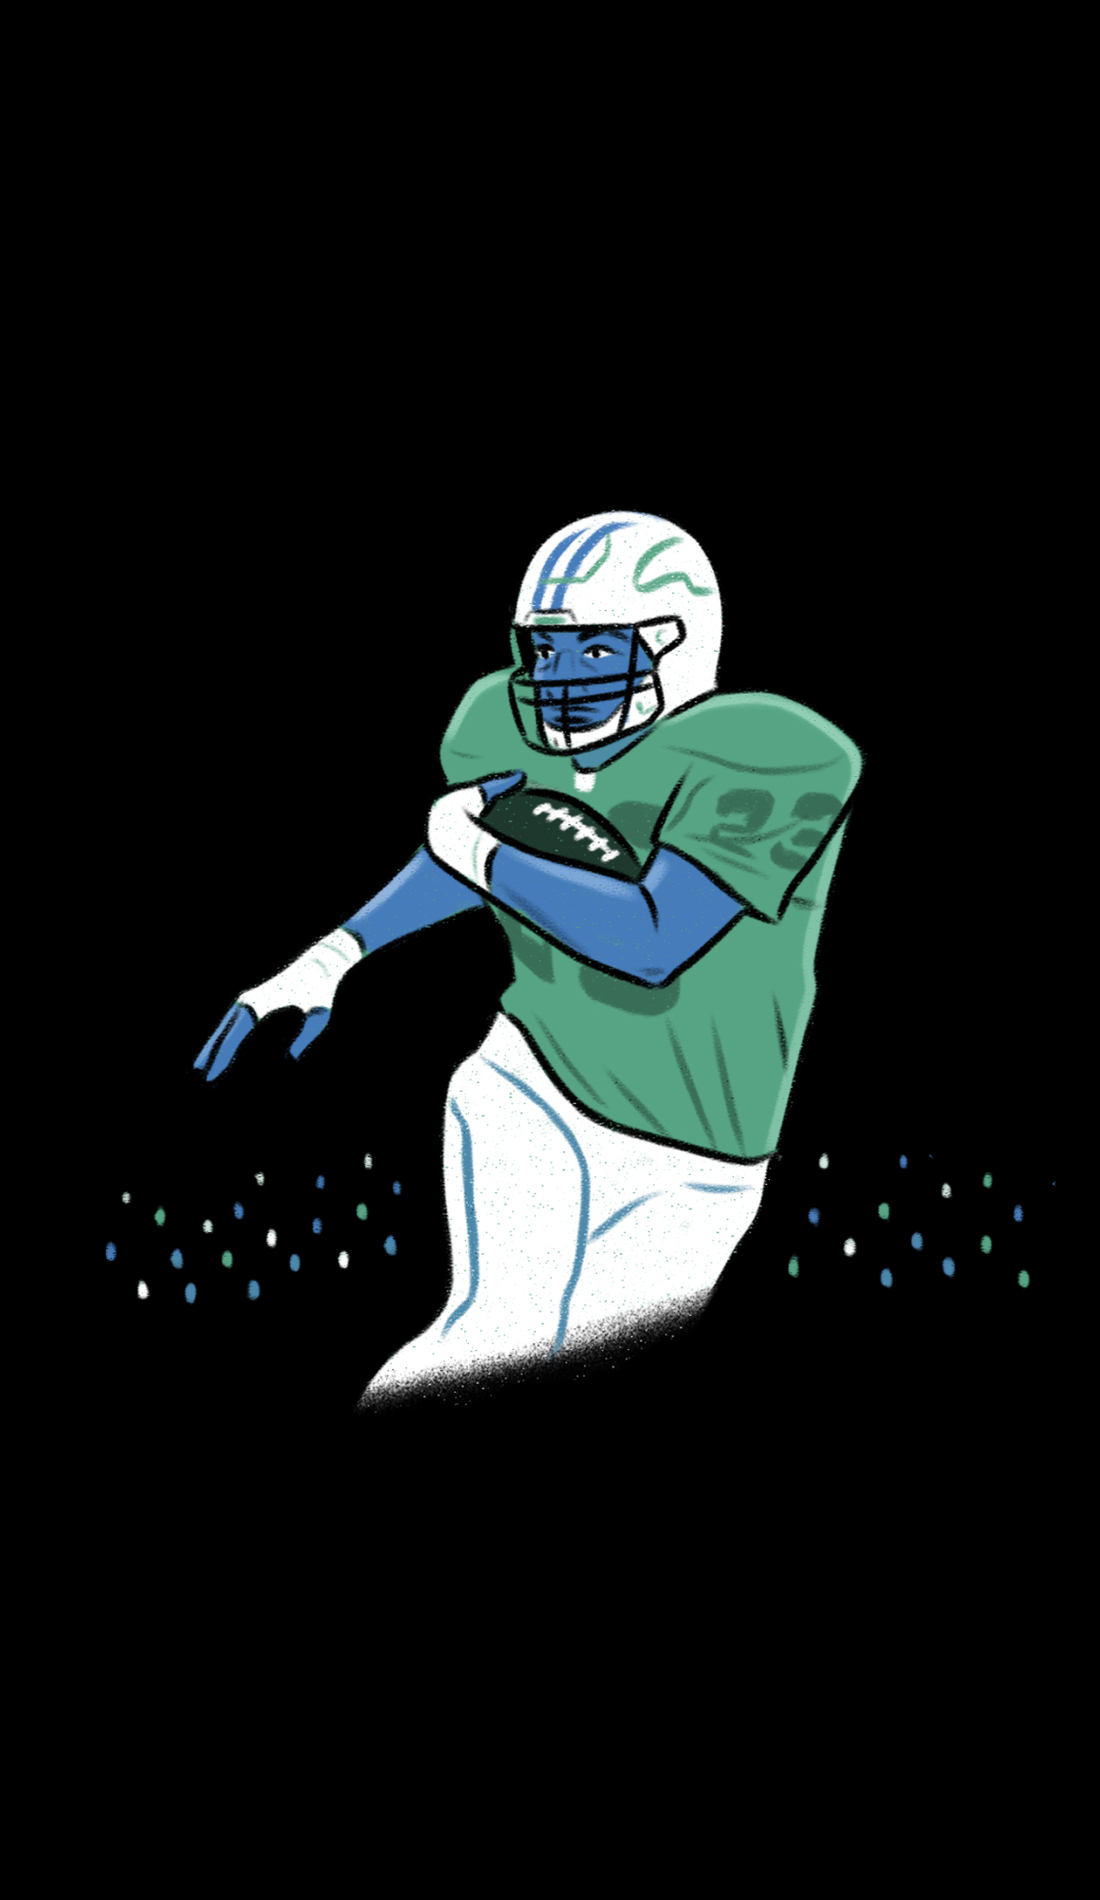 A Chattanooga Mocs Football live event